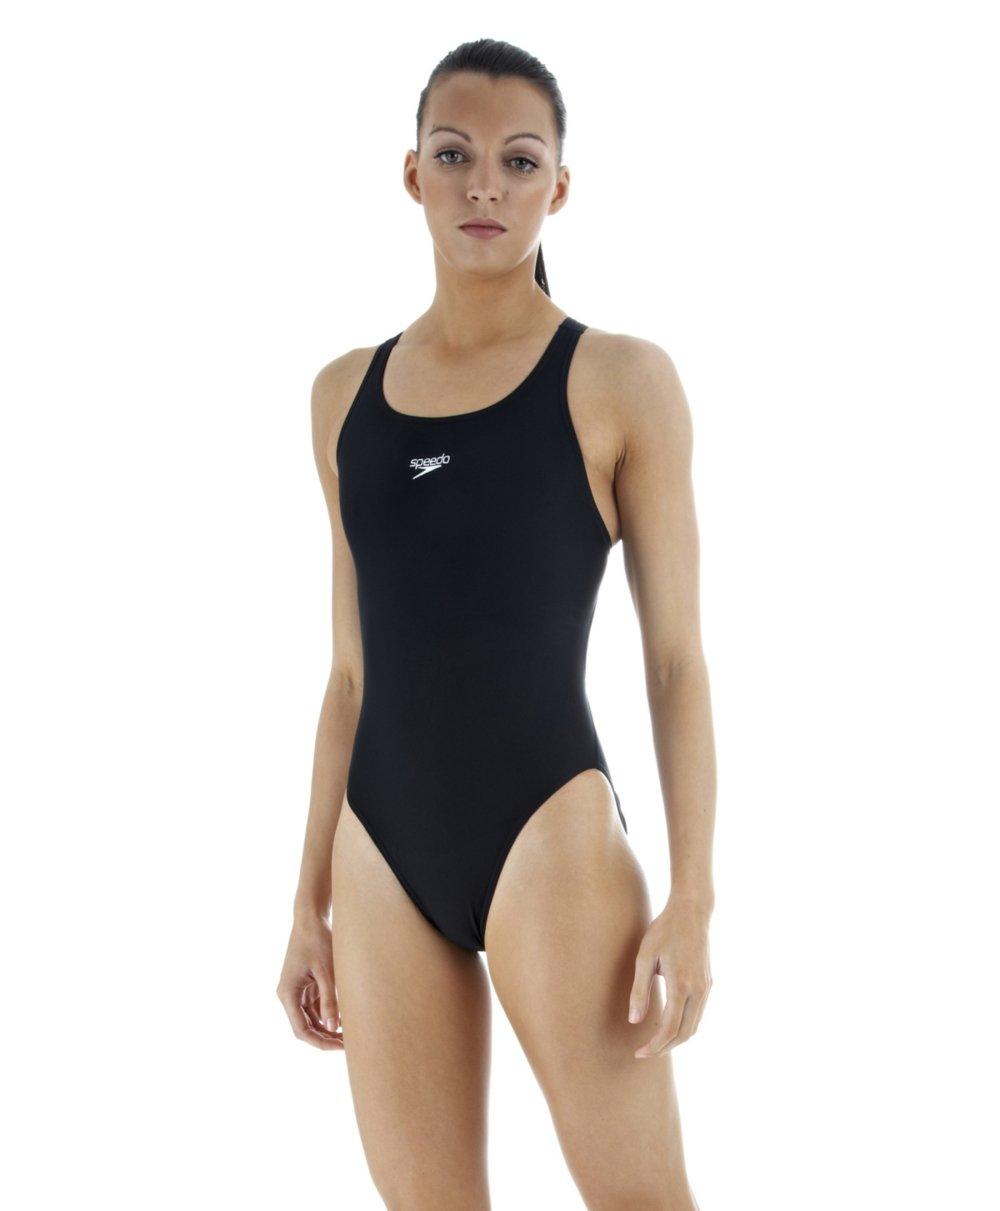 Speedo Damen Badeanzug Color 92 Schwarz Schwarz 38